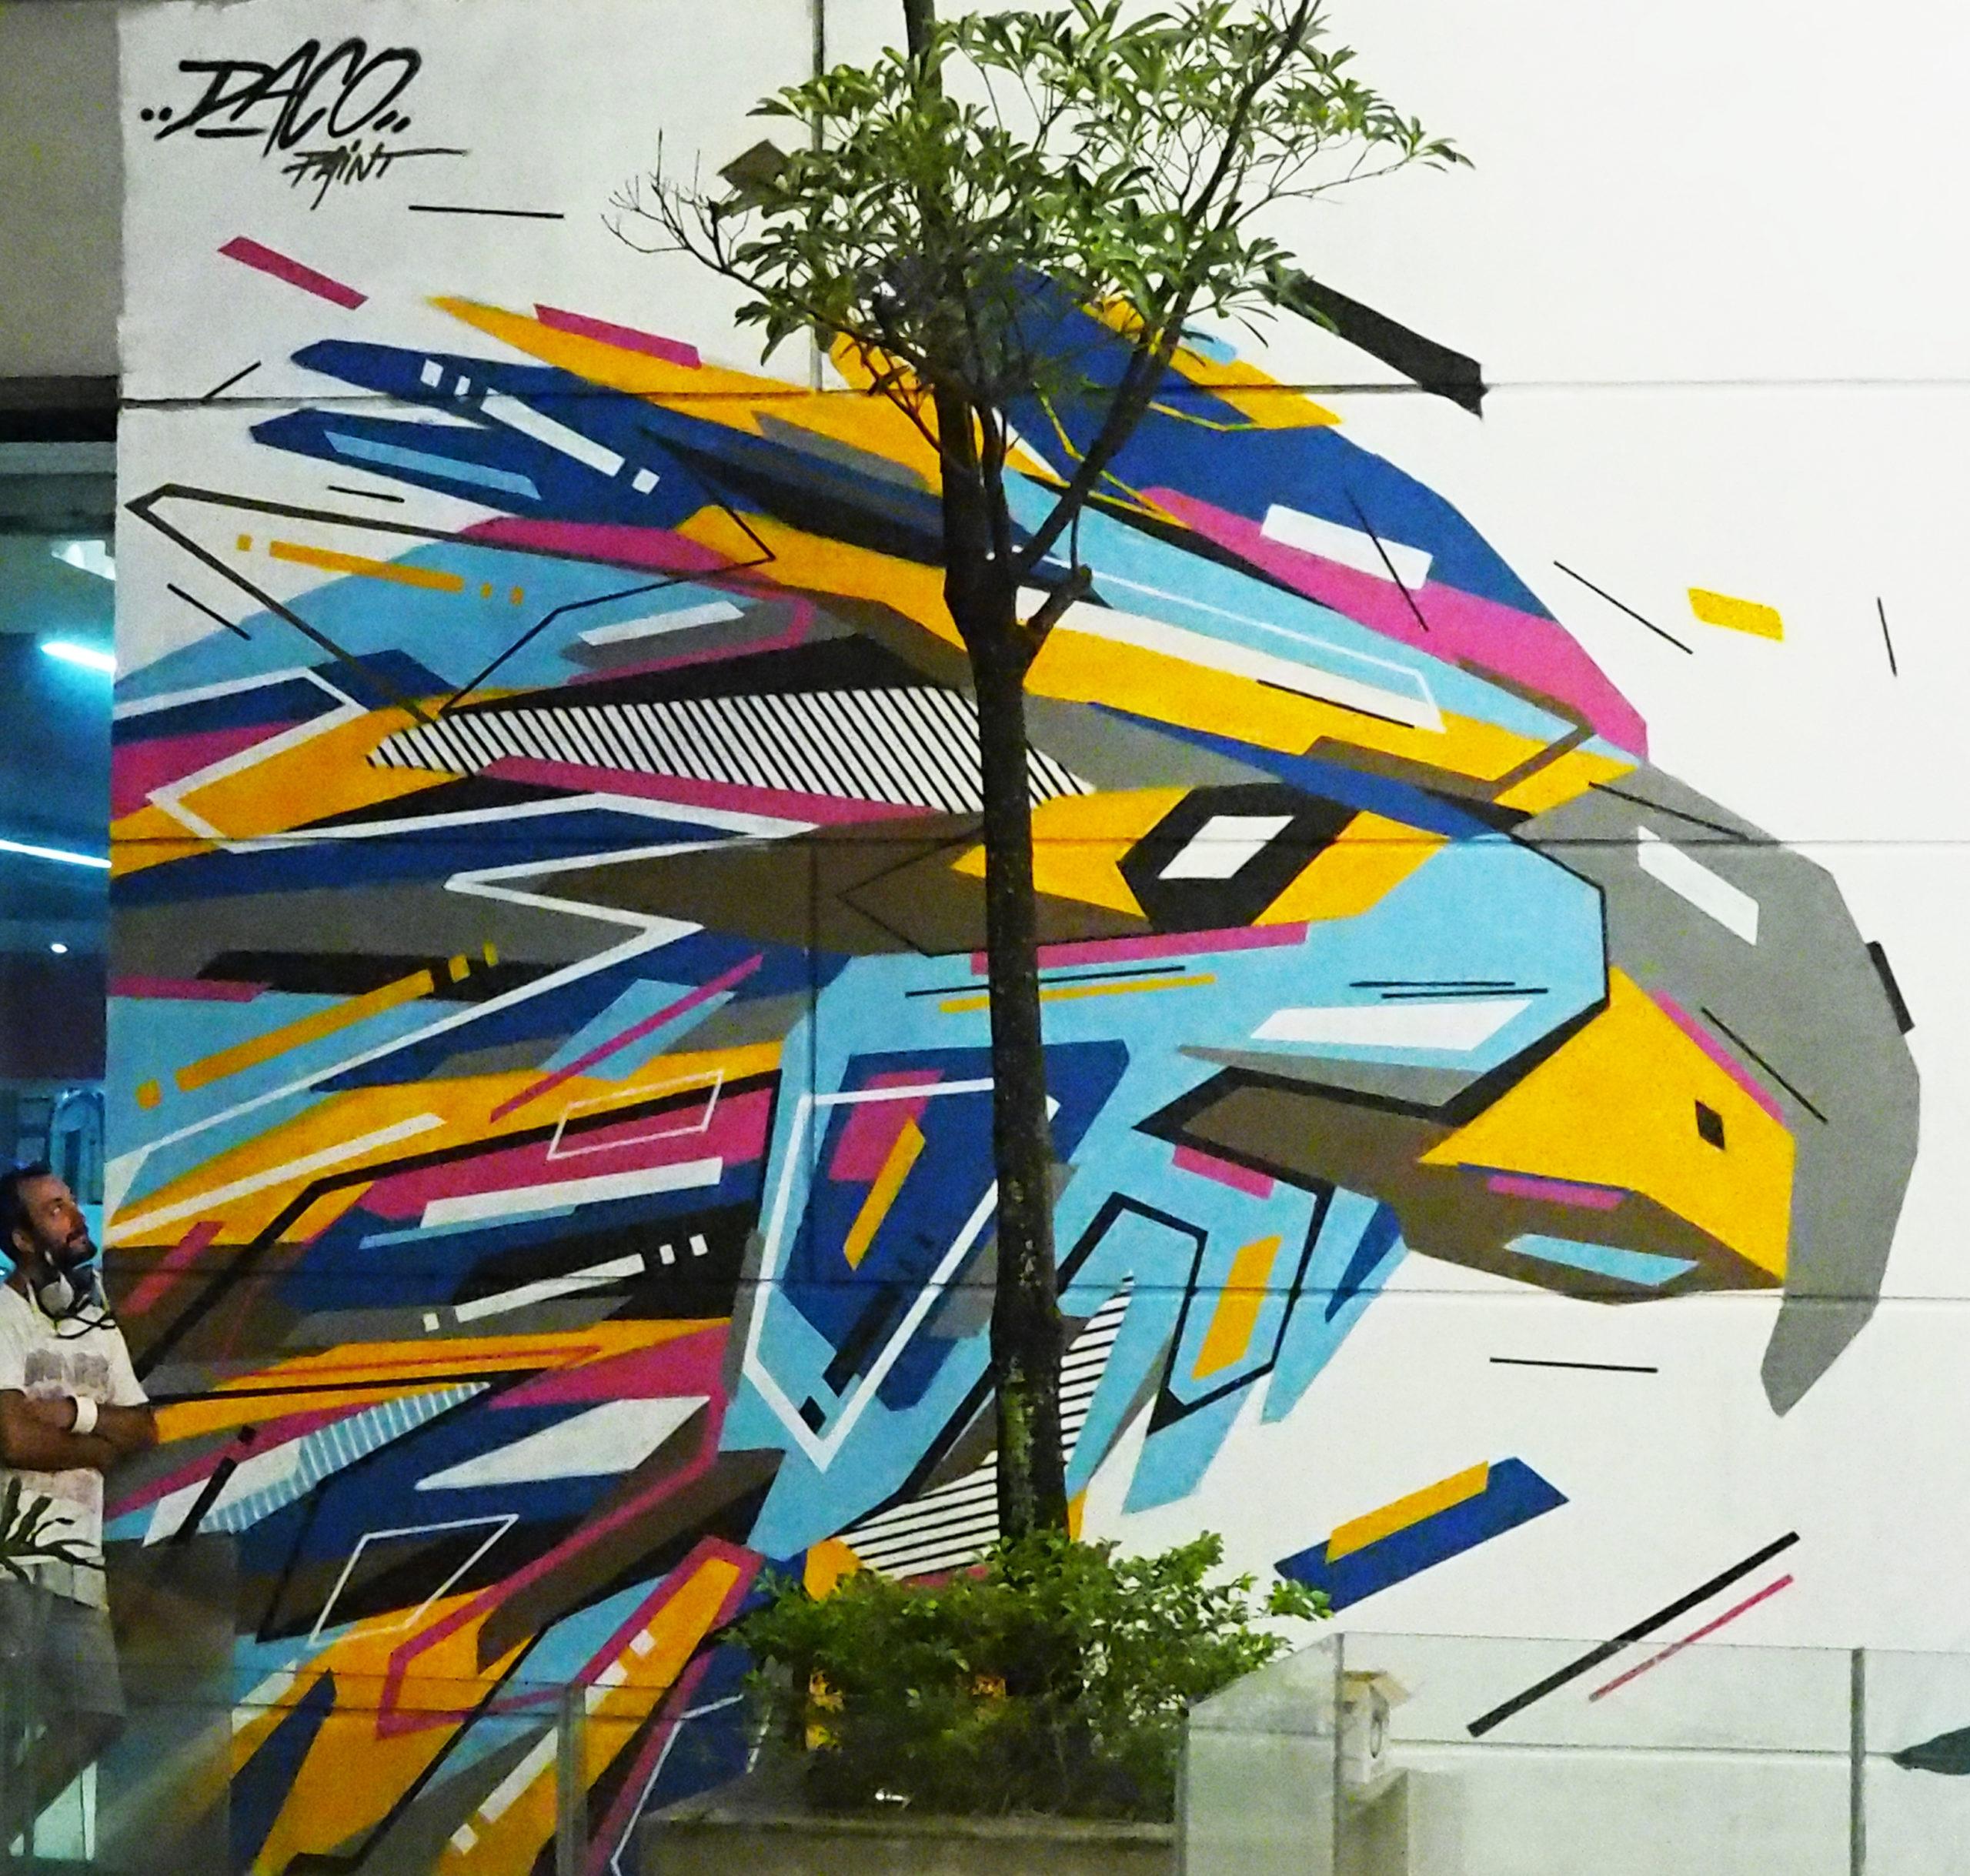 Fresque Graffaune Graffiti aigle réalisée par Daco